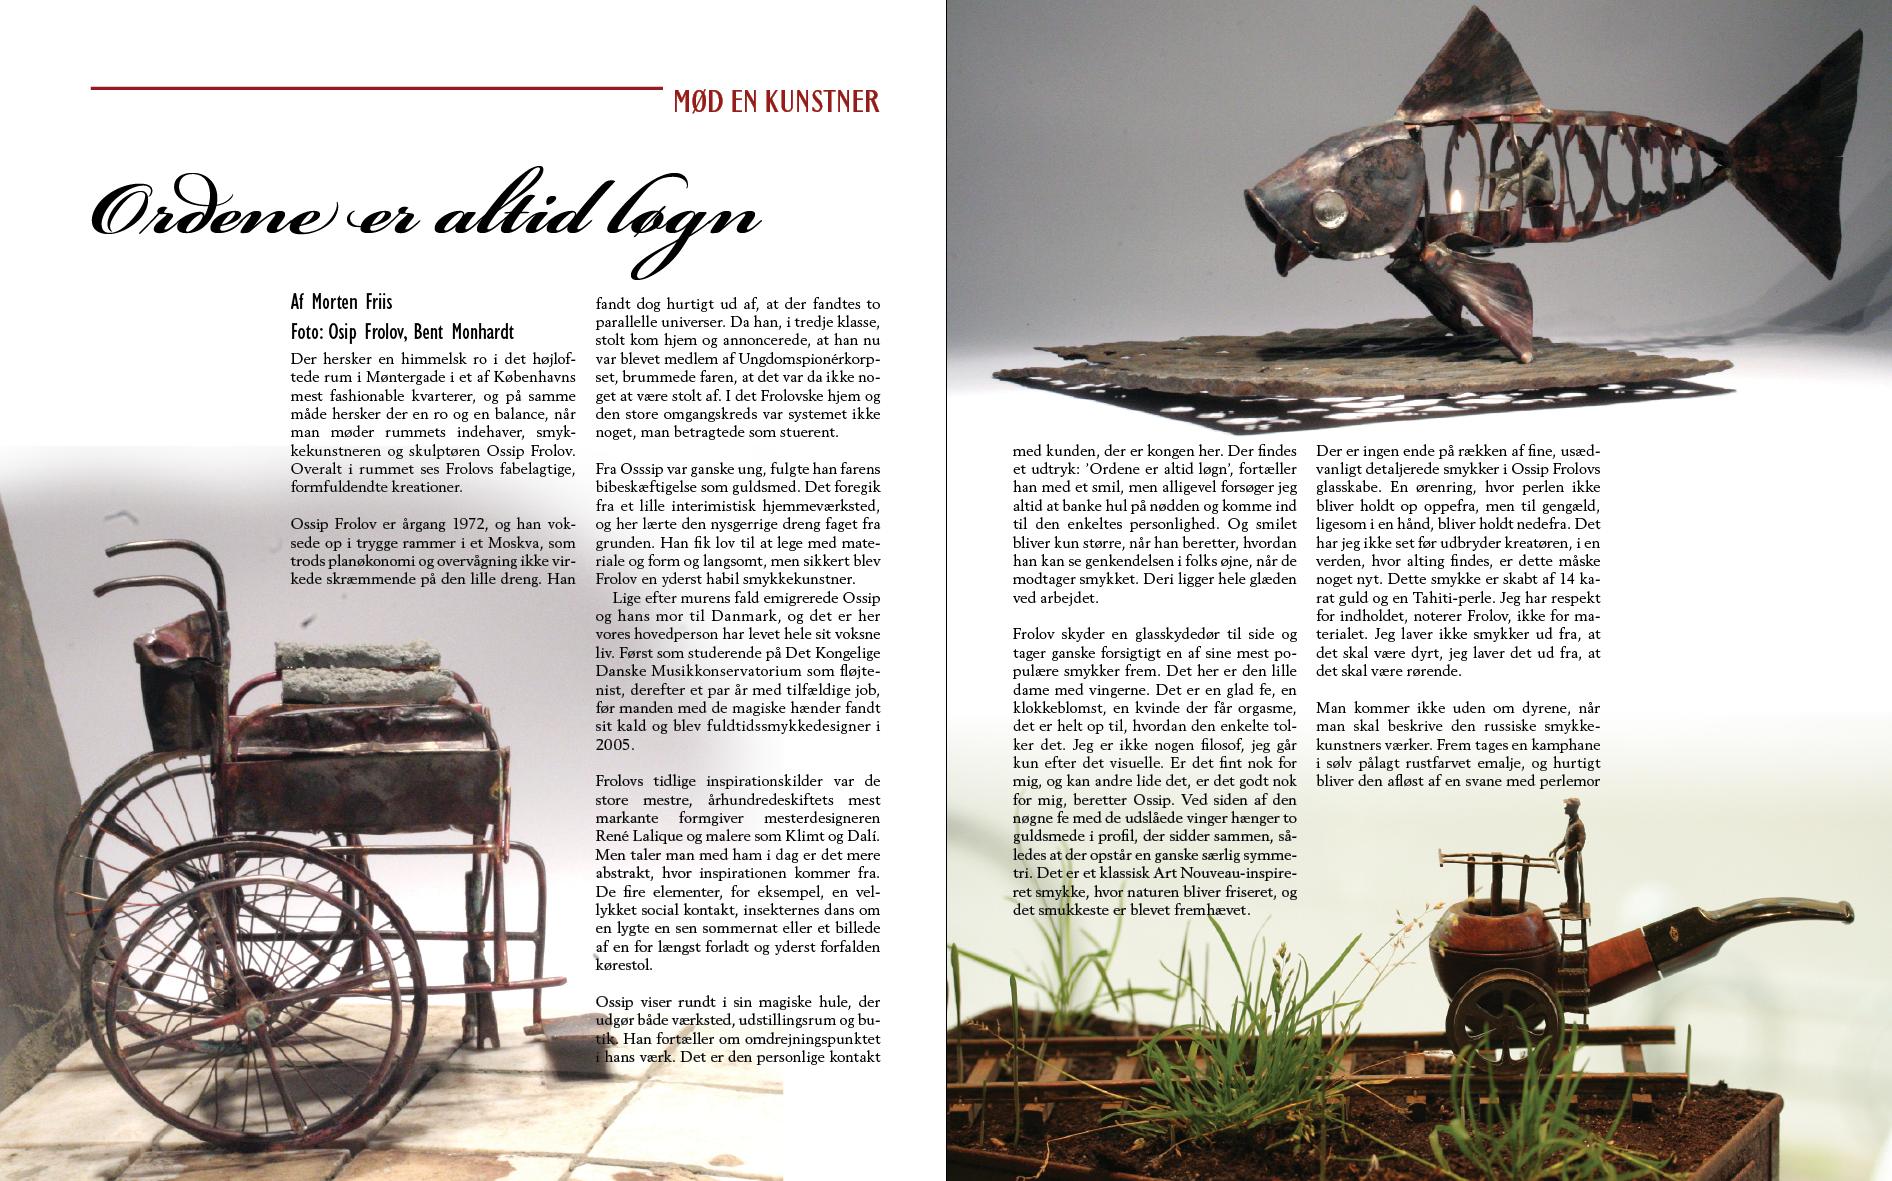 Layout til artiklen om Ossip Frolov, Frolov smykkedesign